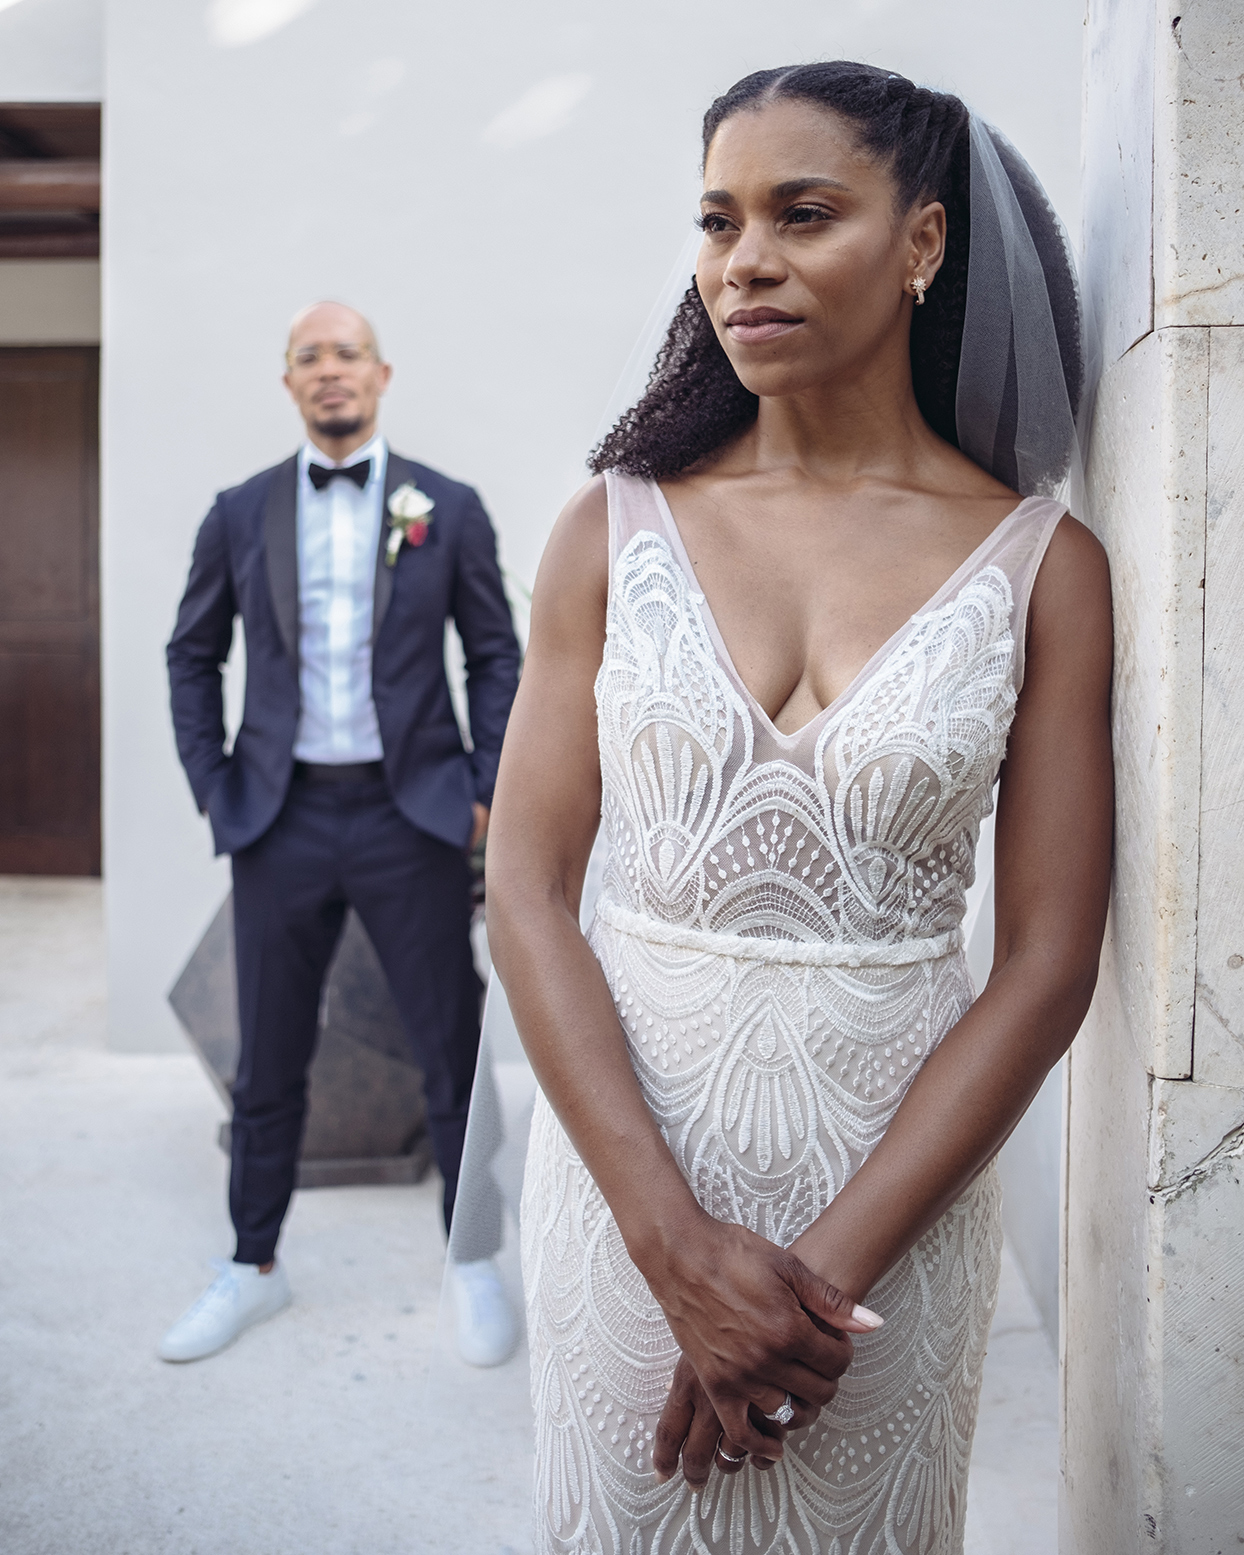 kelly mccreary standing in wedding dress in front of groom